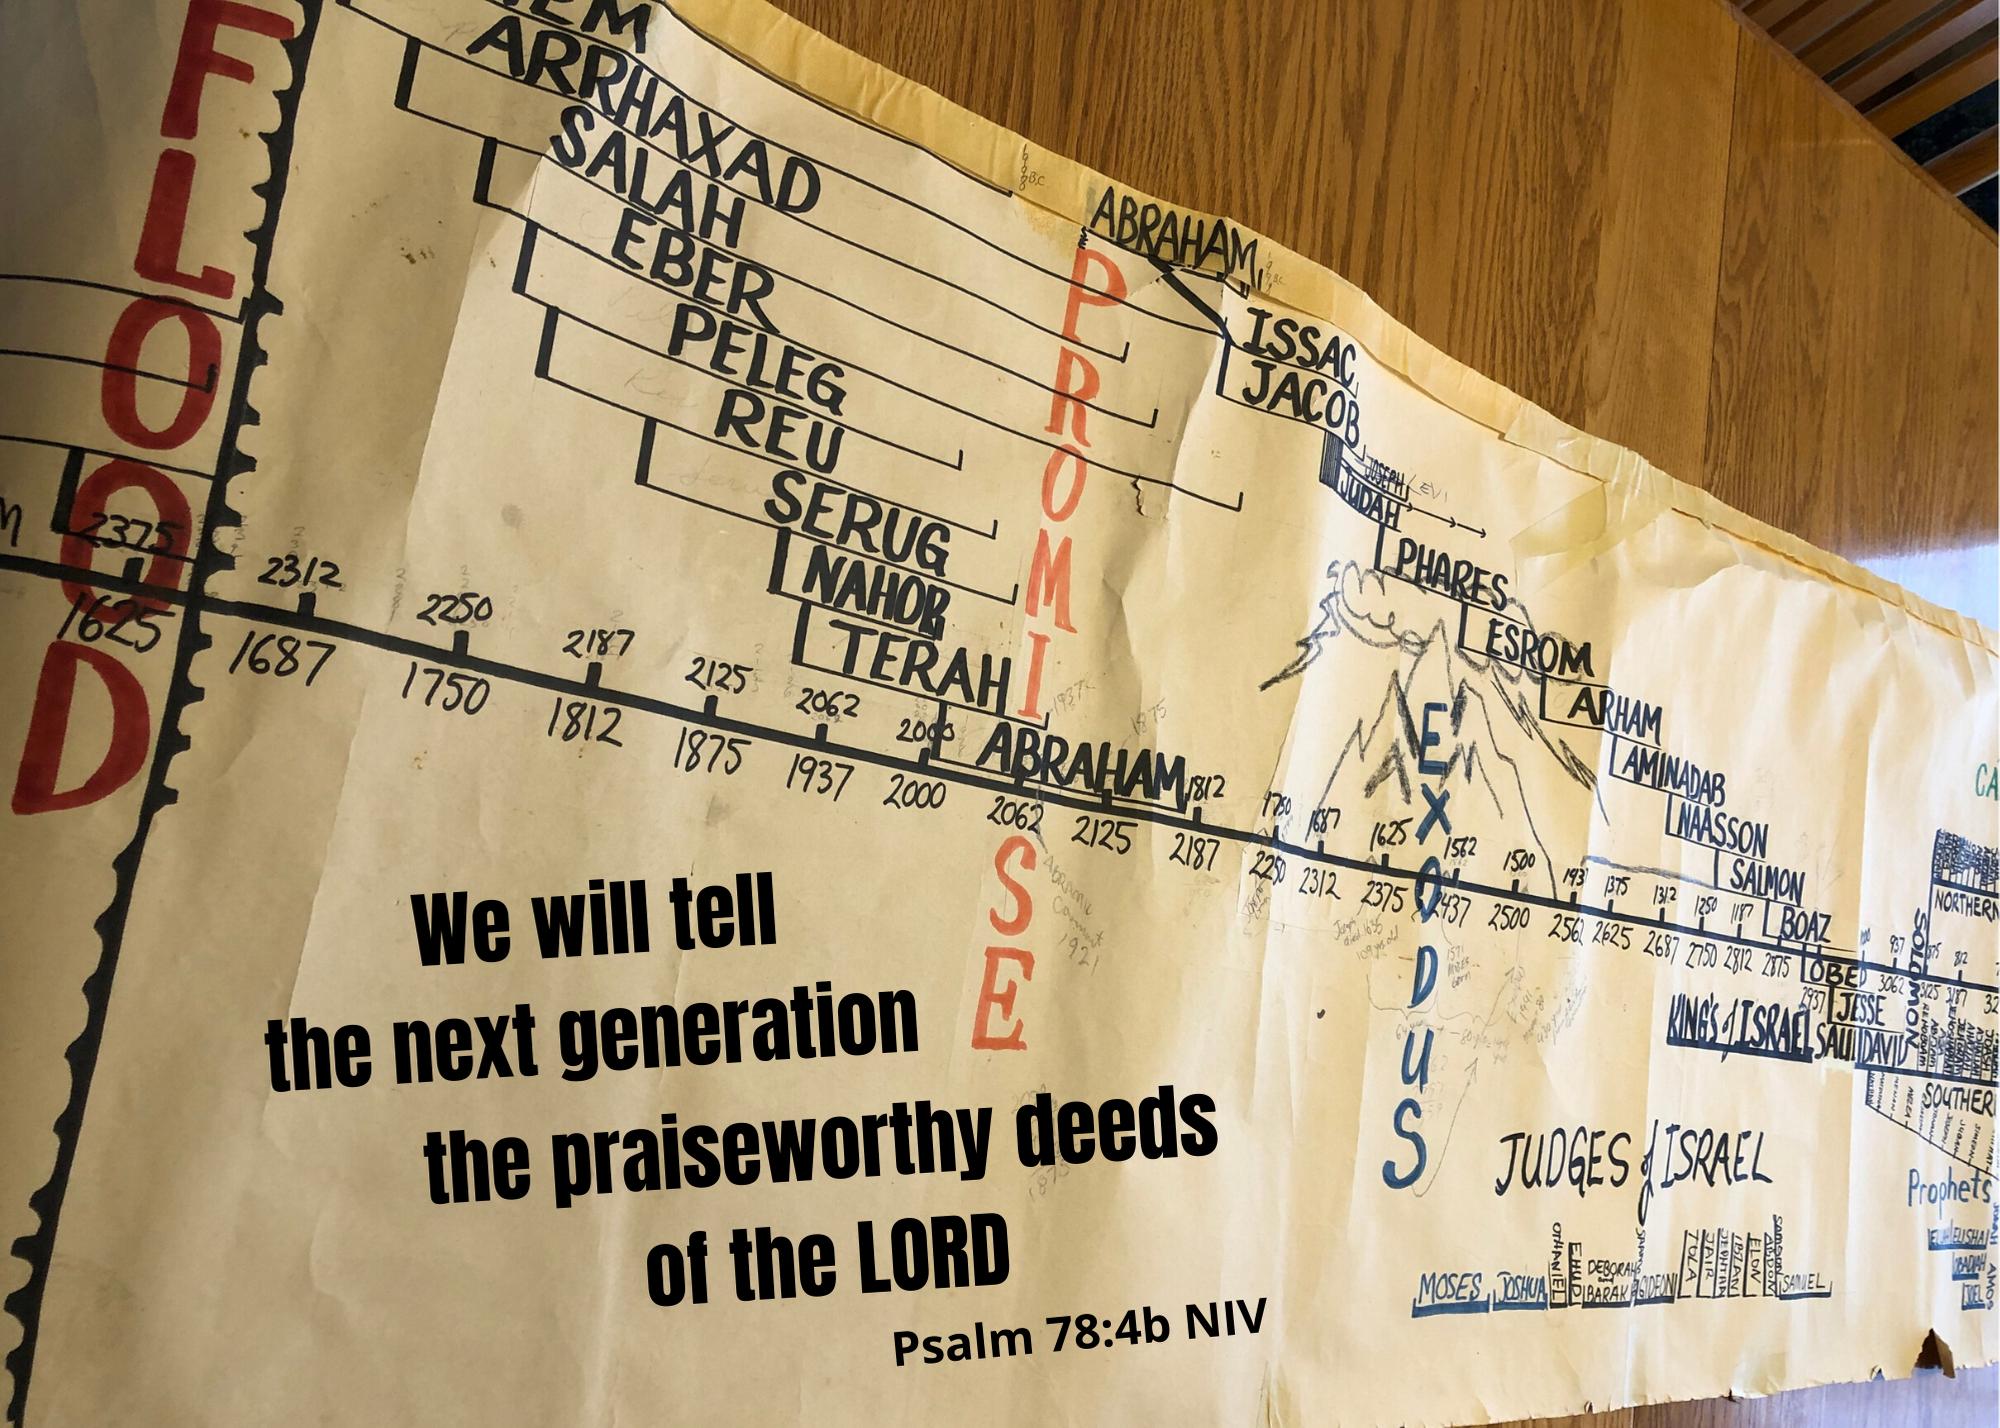 Psalm 78 4b NIV